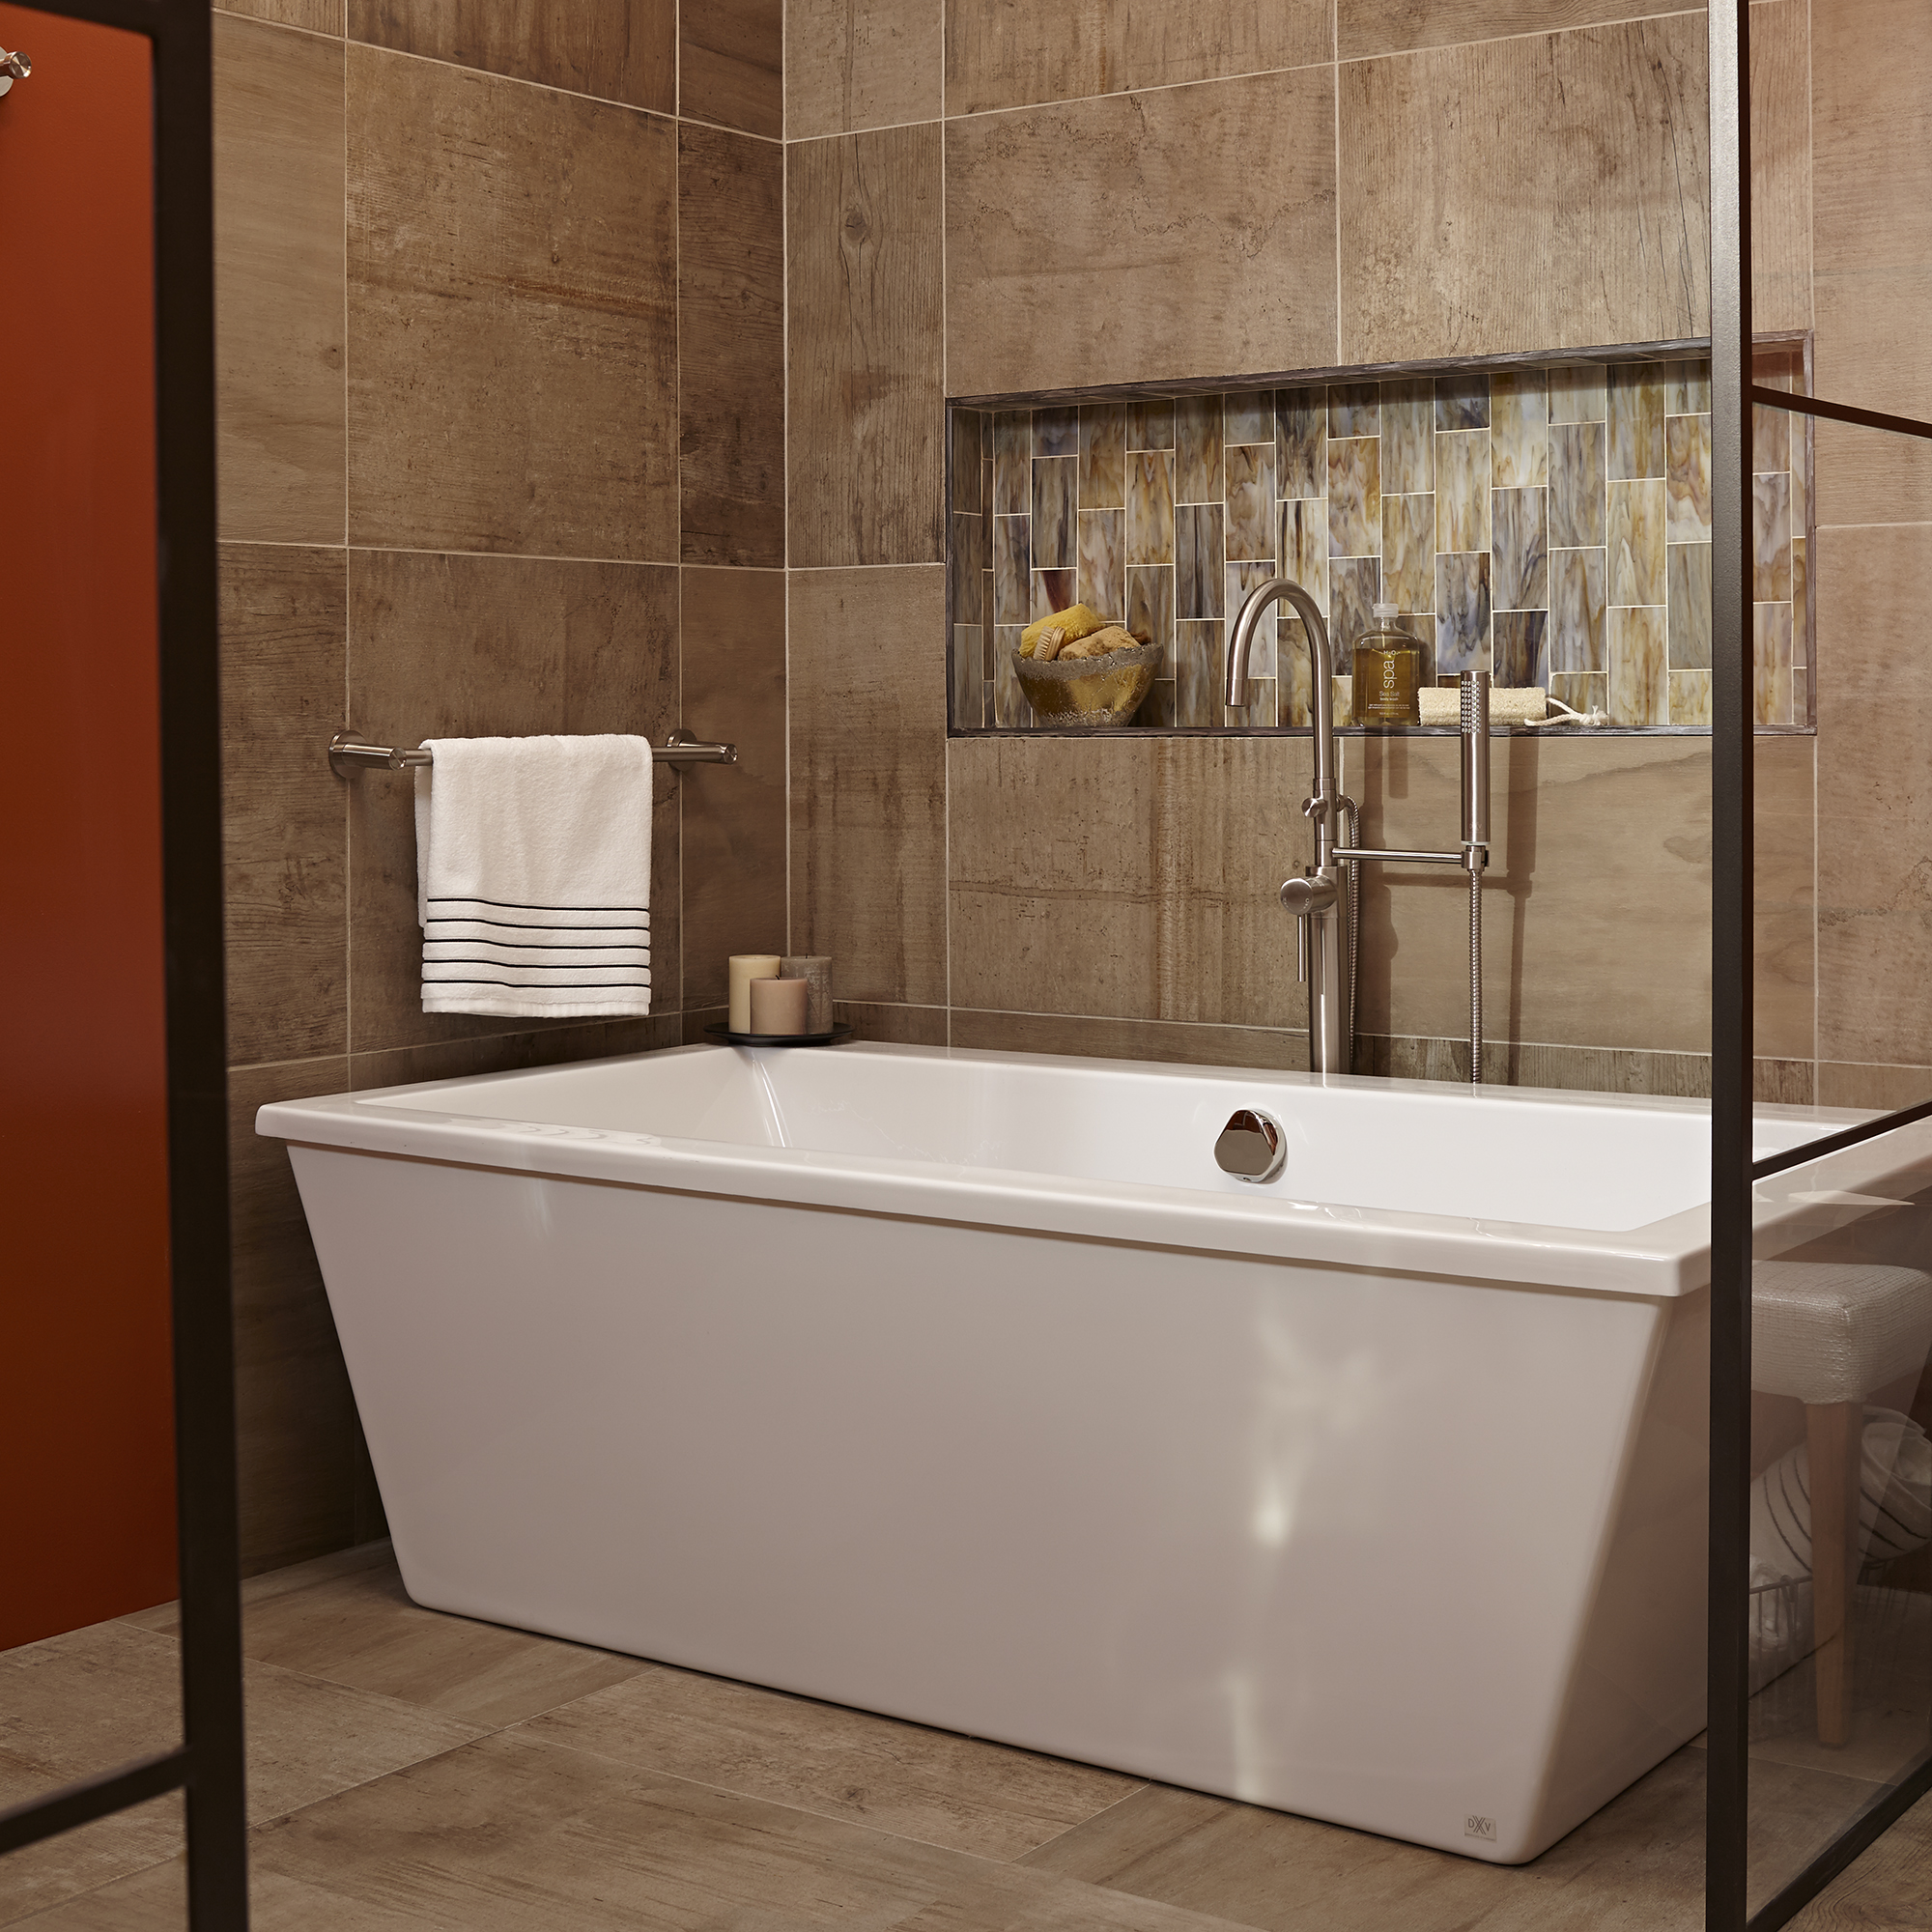 DXV: A Balanced Bath